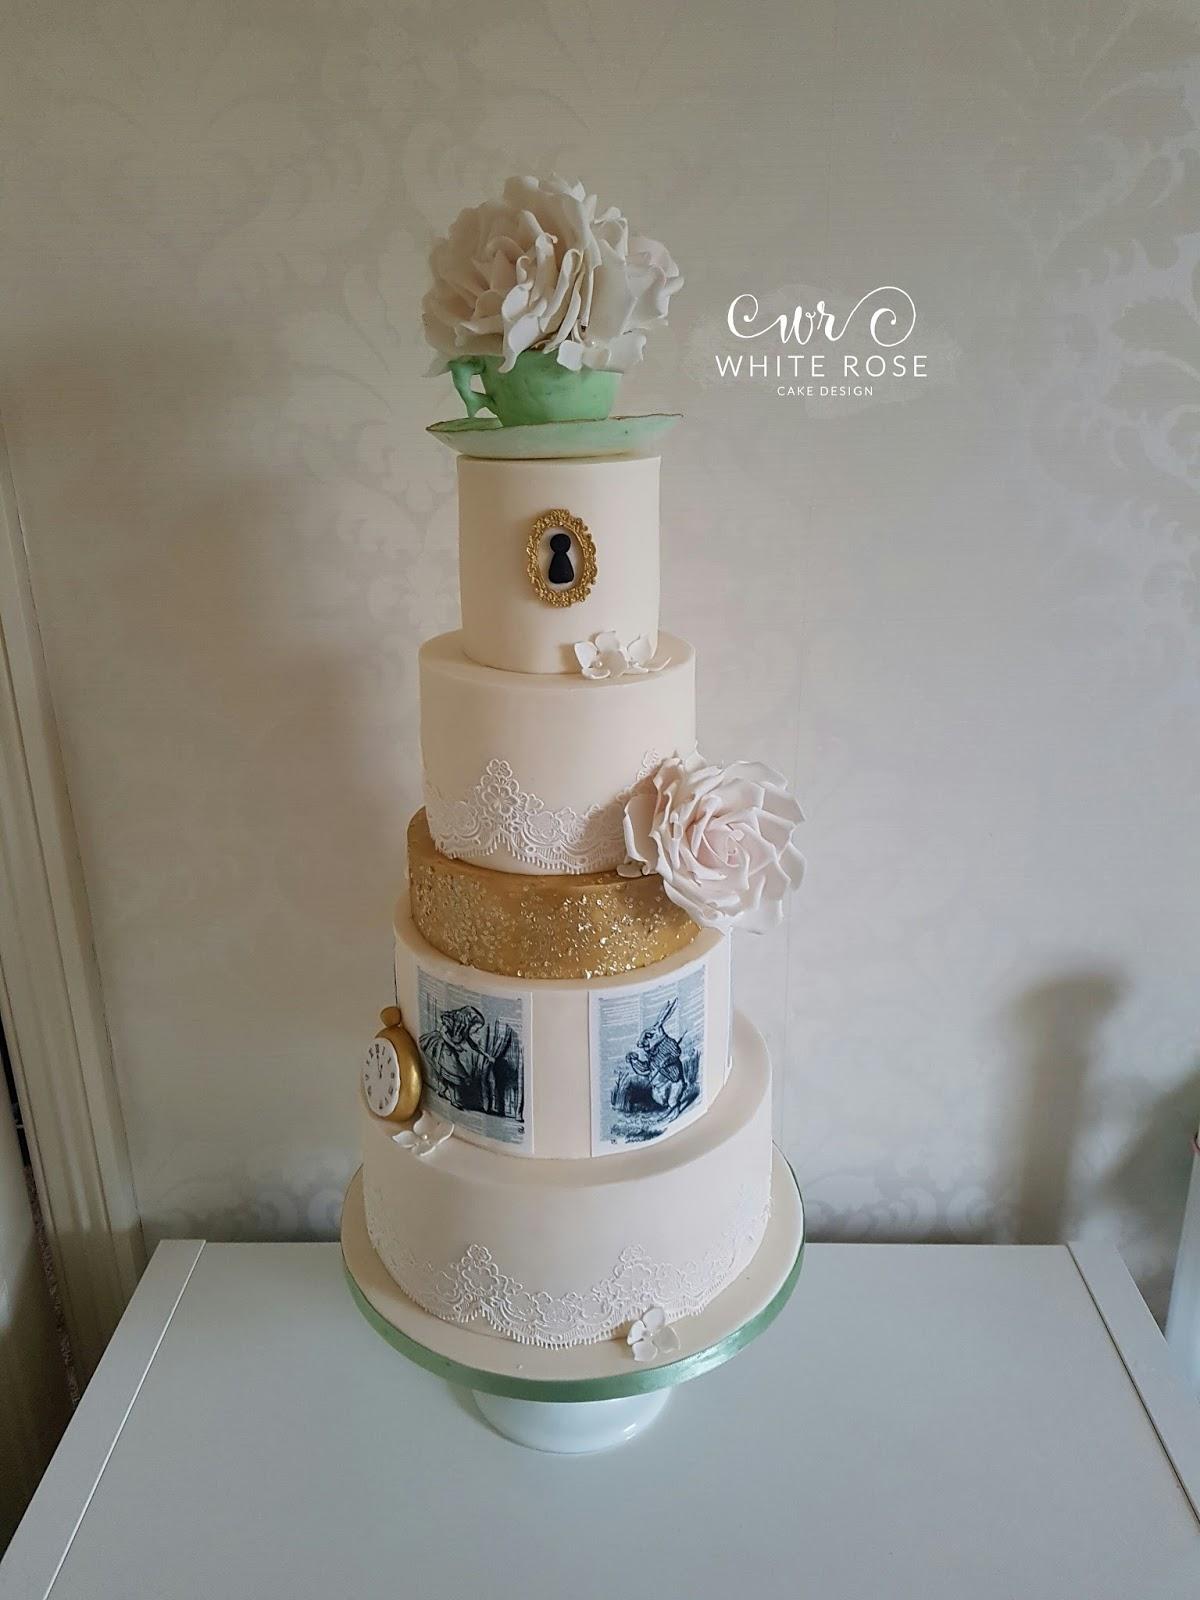 White Rose Cake Design Alice In Wonderland Inspired Wedding Cake